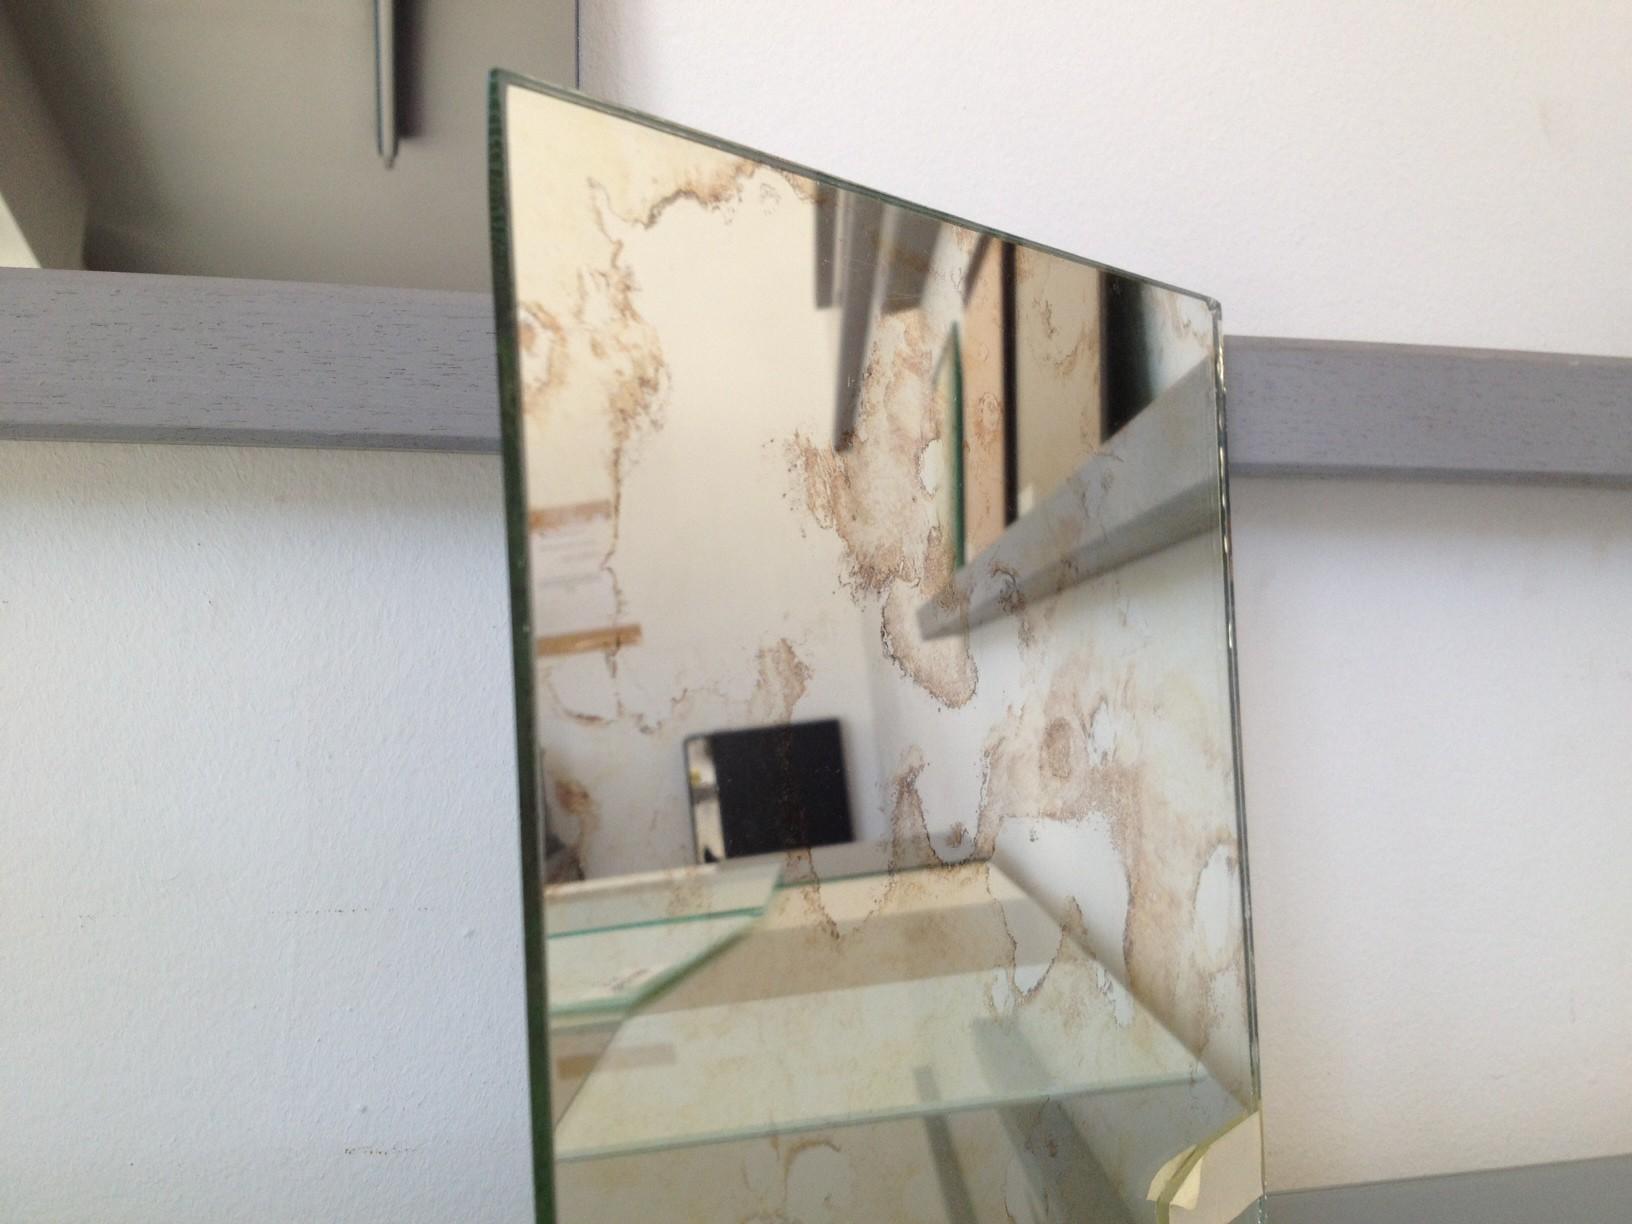 Miroir danse pas cher 46176 miroir id es - Miroir psyche pas cher ...